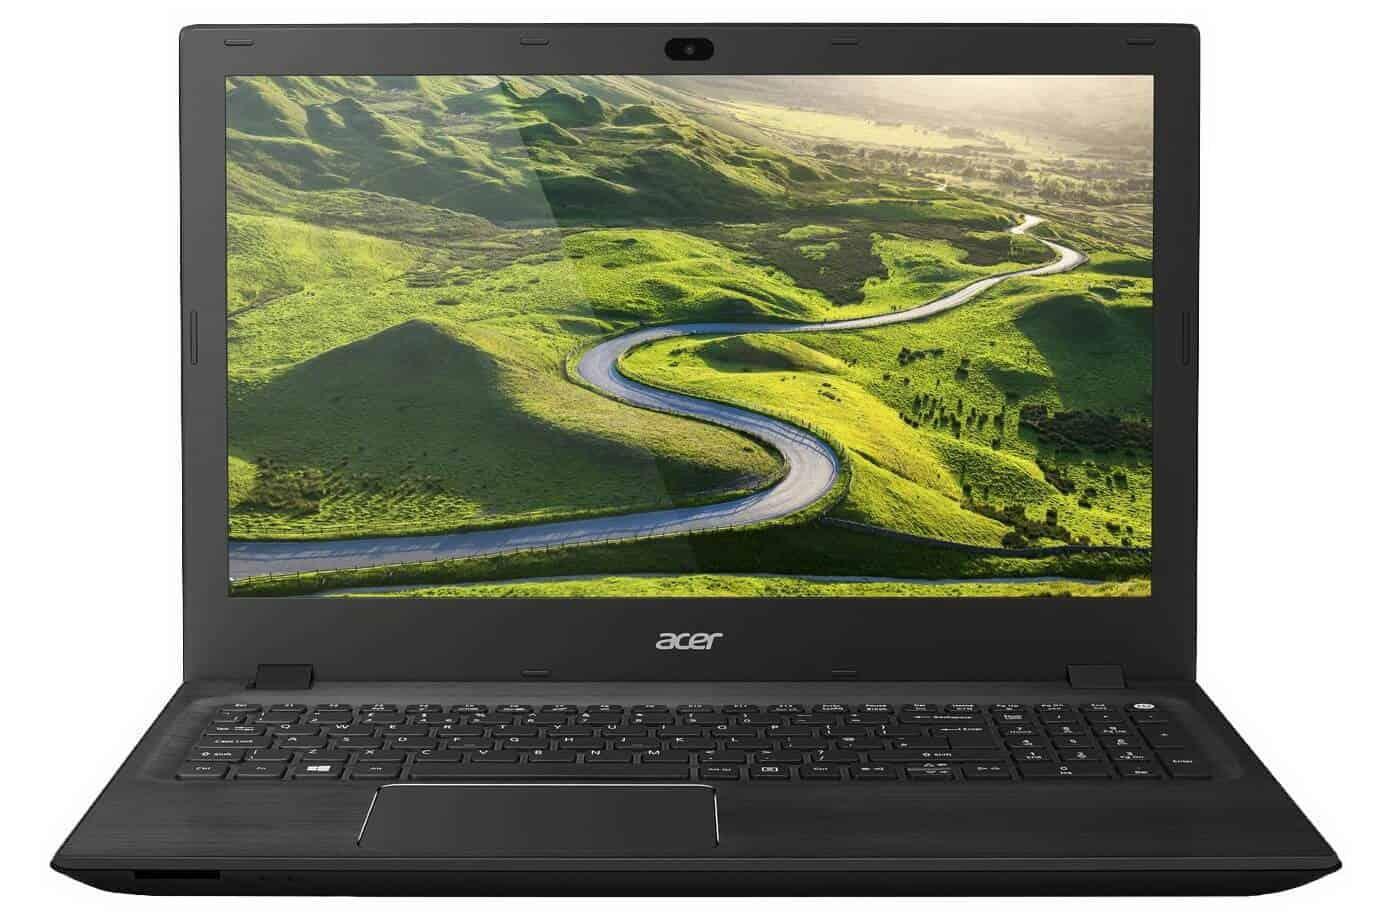 Acer Aspire F5-572G-70SS